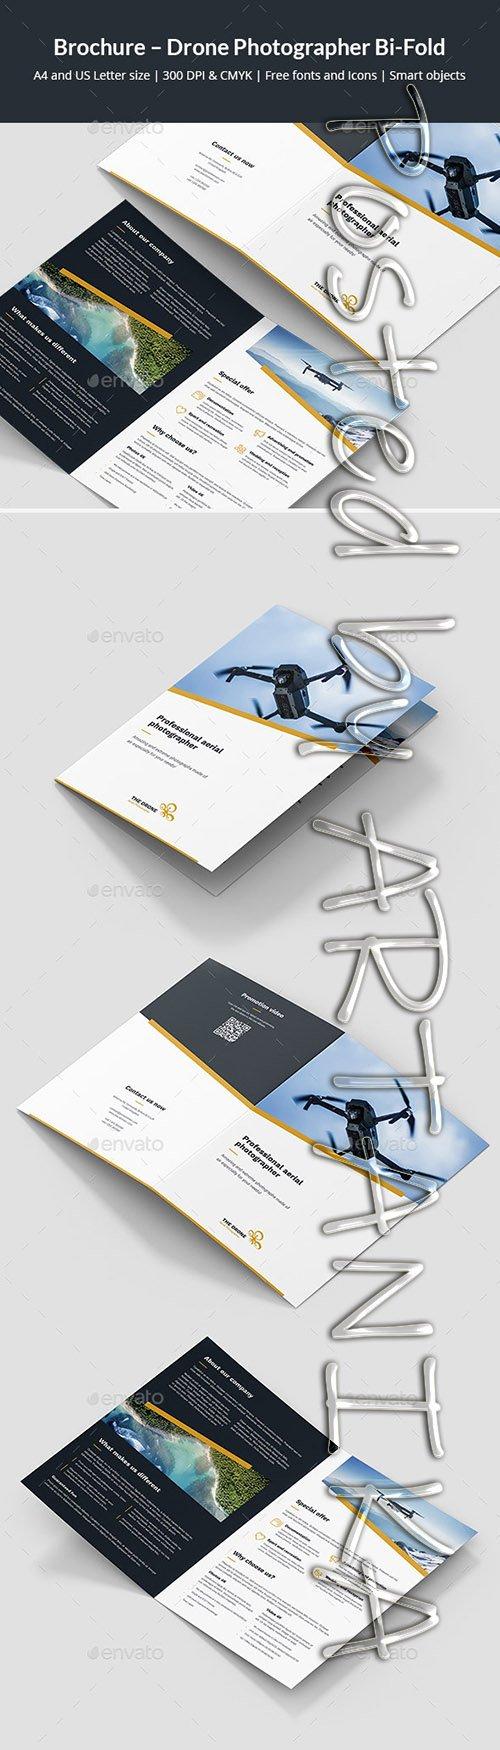 Brochure Drone Photographer Bi-Fold 24257322